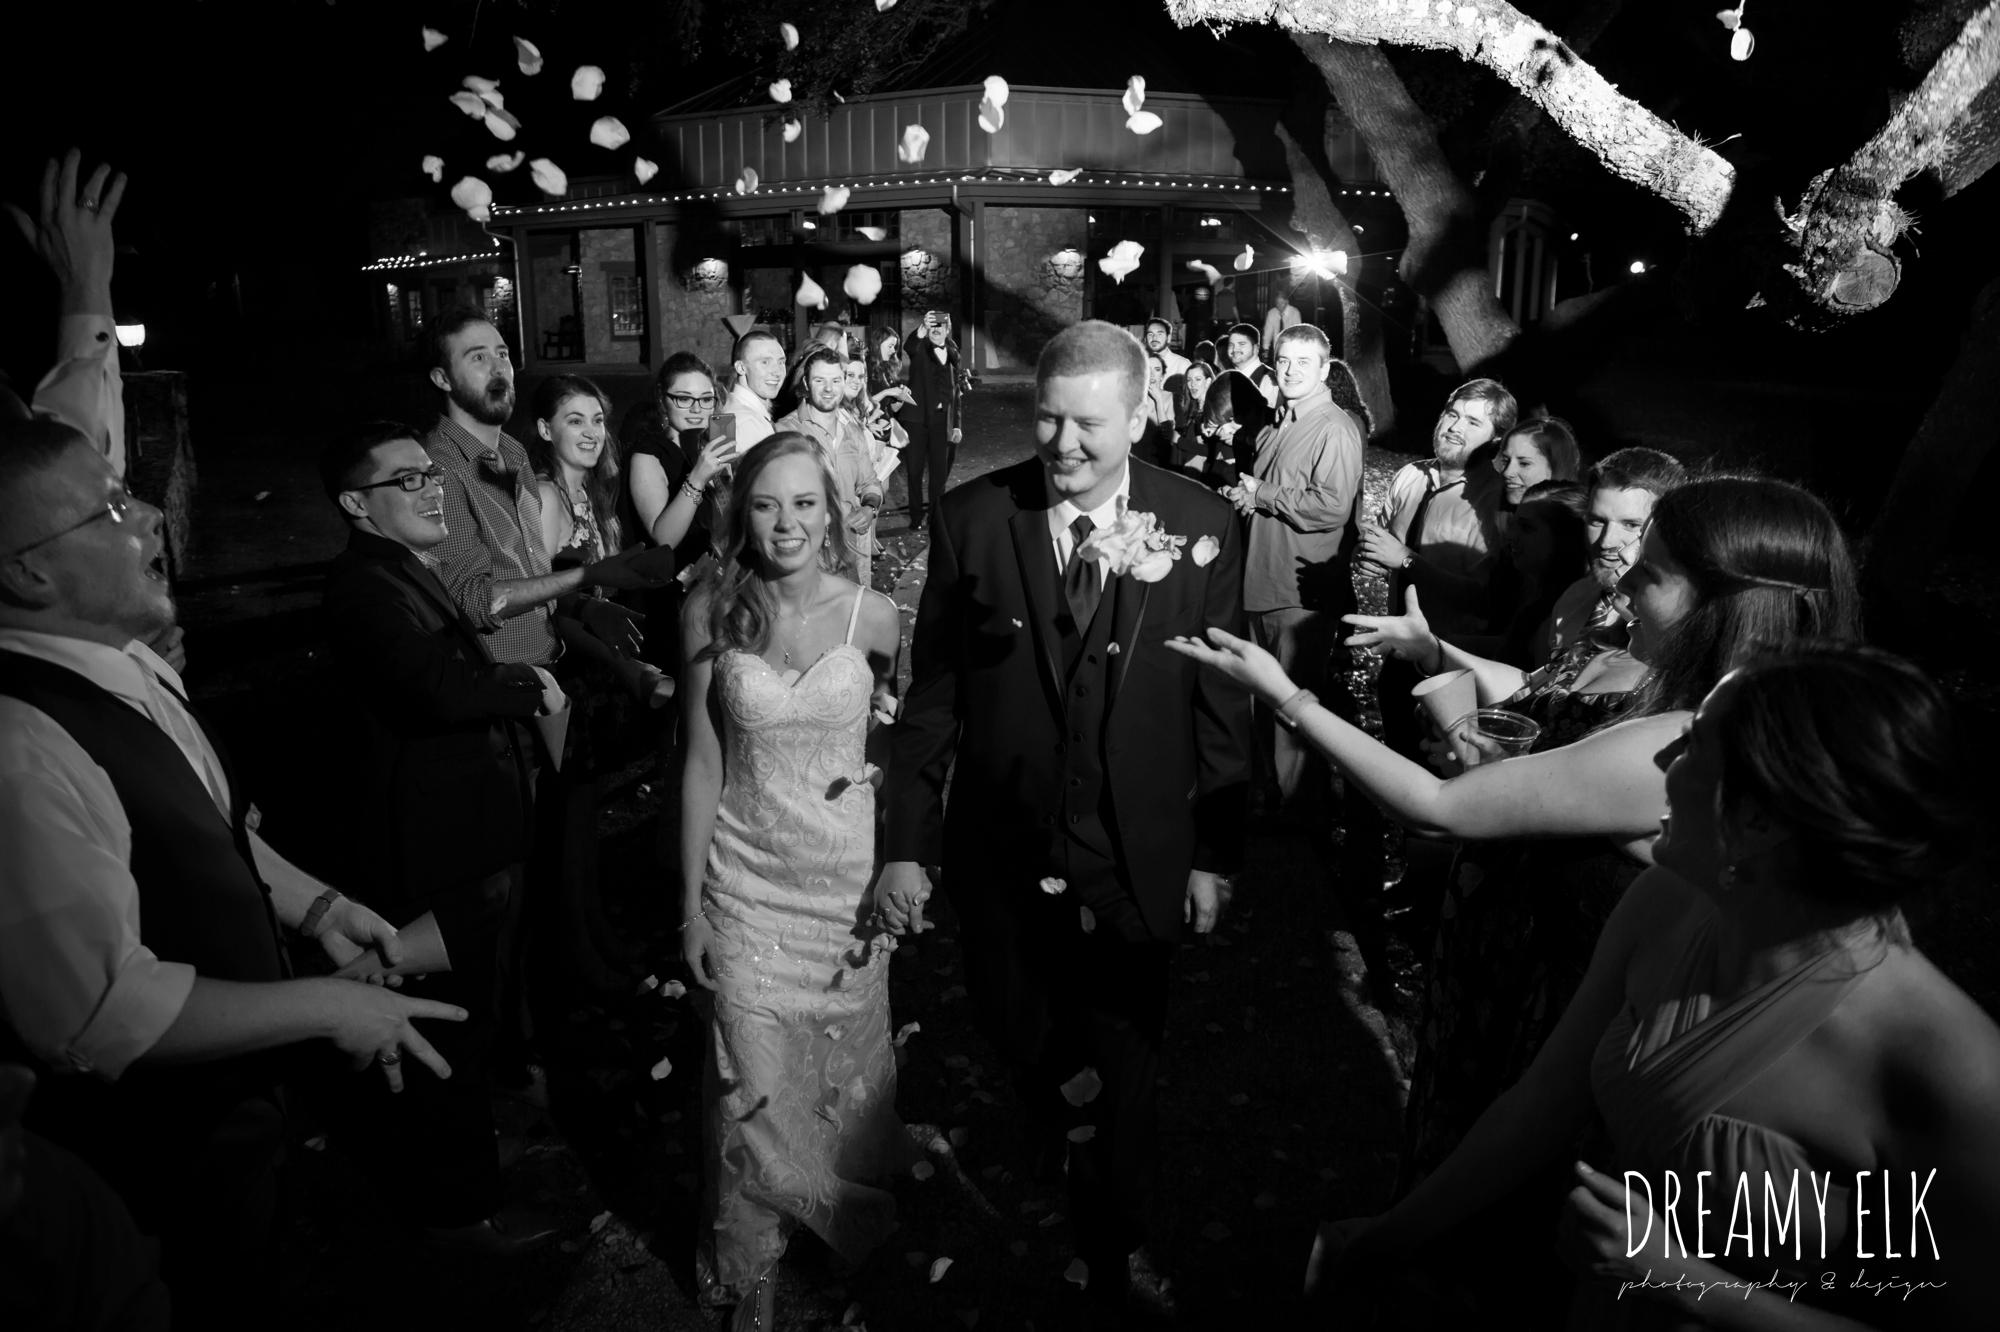 night evening wedding send off with rose petals, cloudy march wedding photo, canyon springs golf club wedding, san antonio, texas {dreamy elk photography and design}